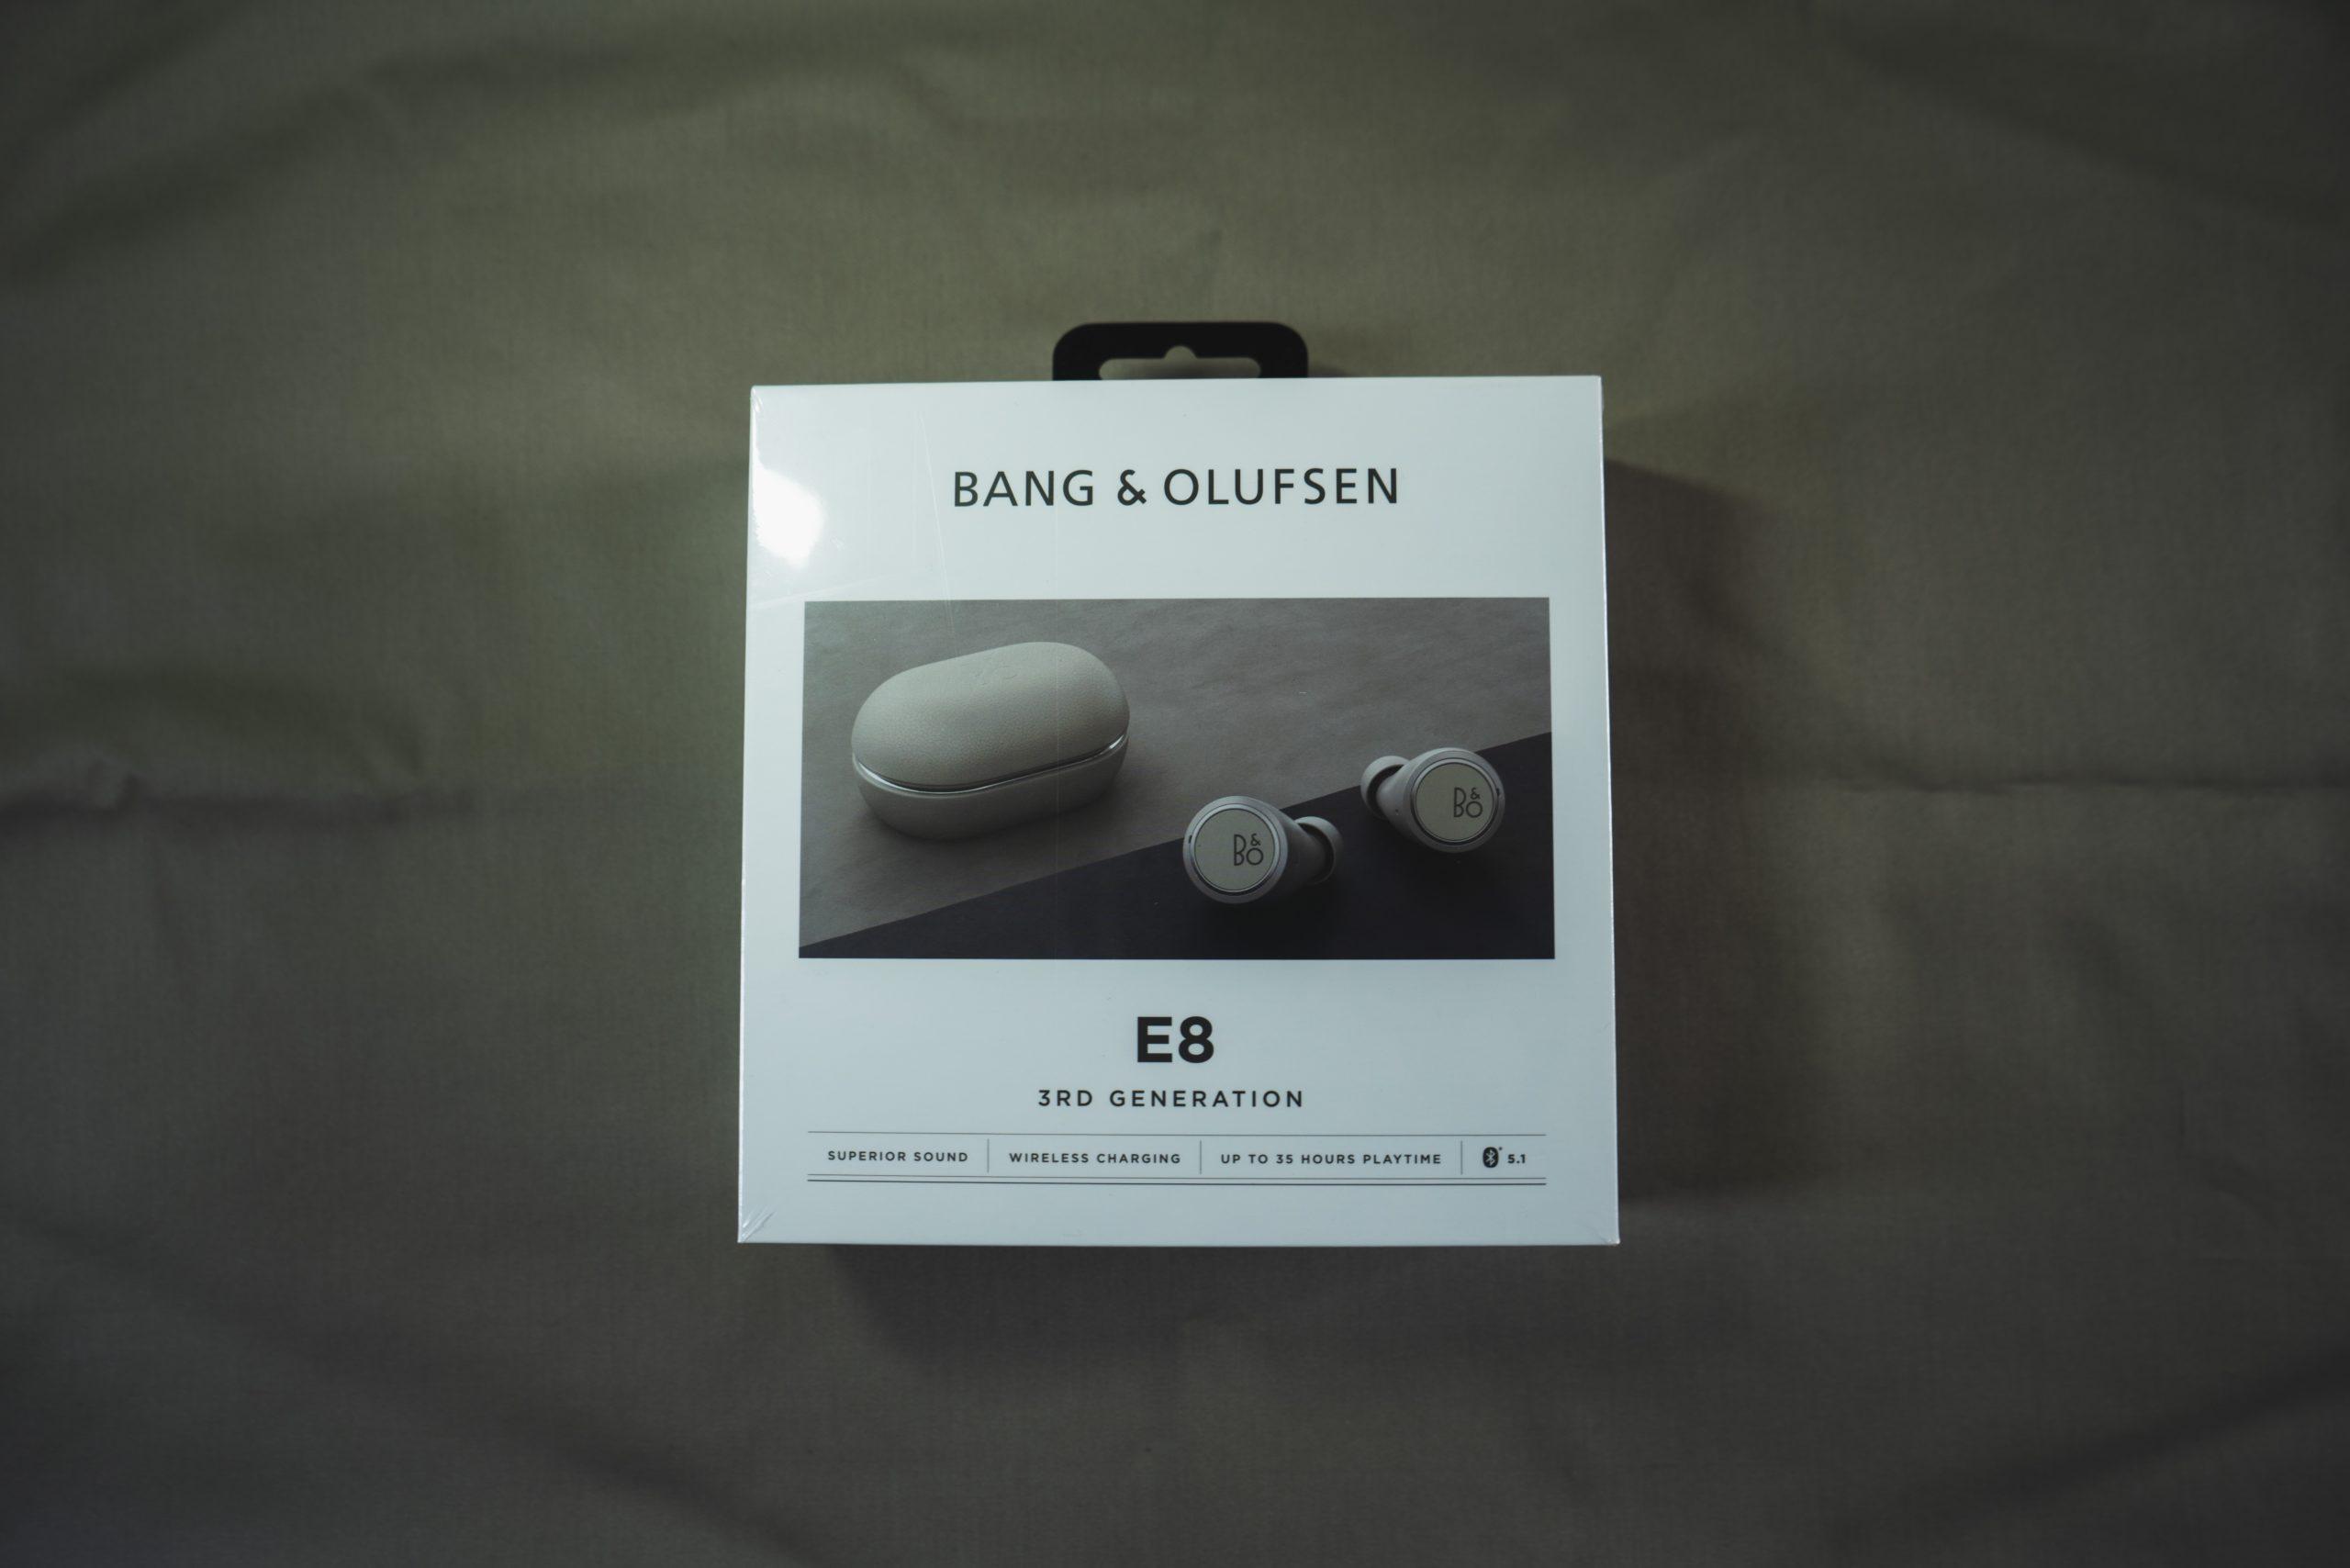 Bang&Olufsenのワイヤレスイヤホン「Beoplay E8 3rd Gen」の梱包